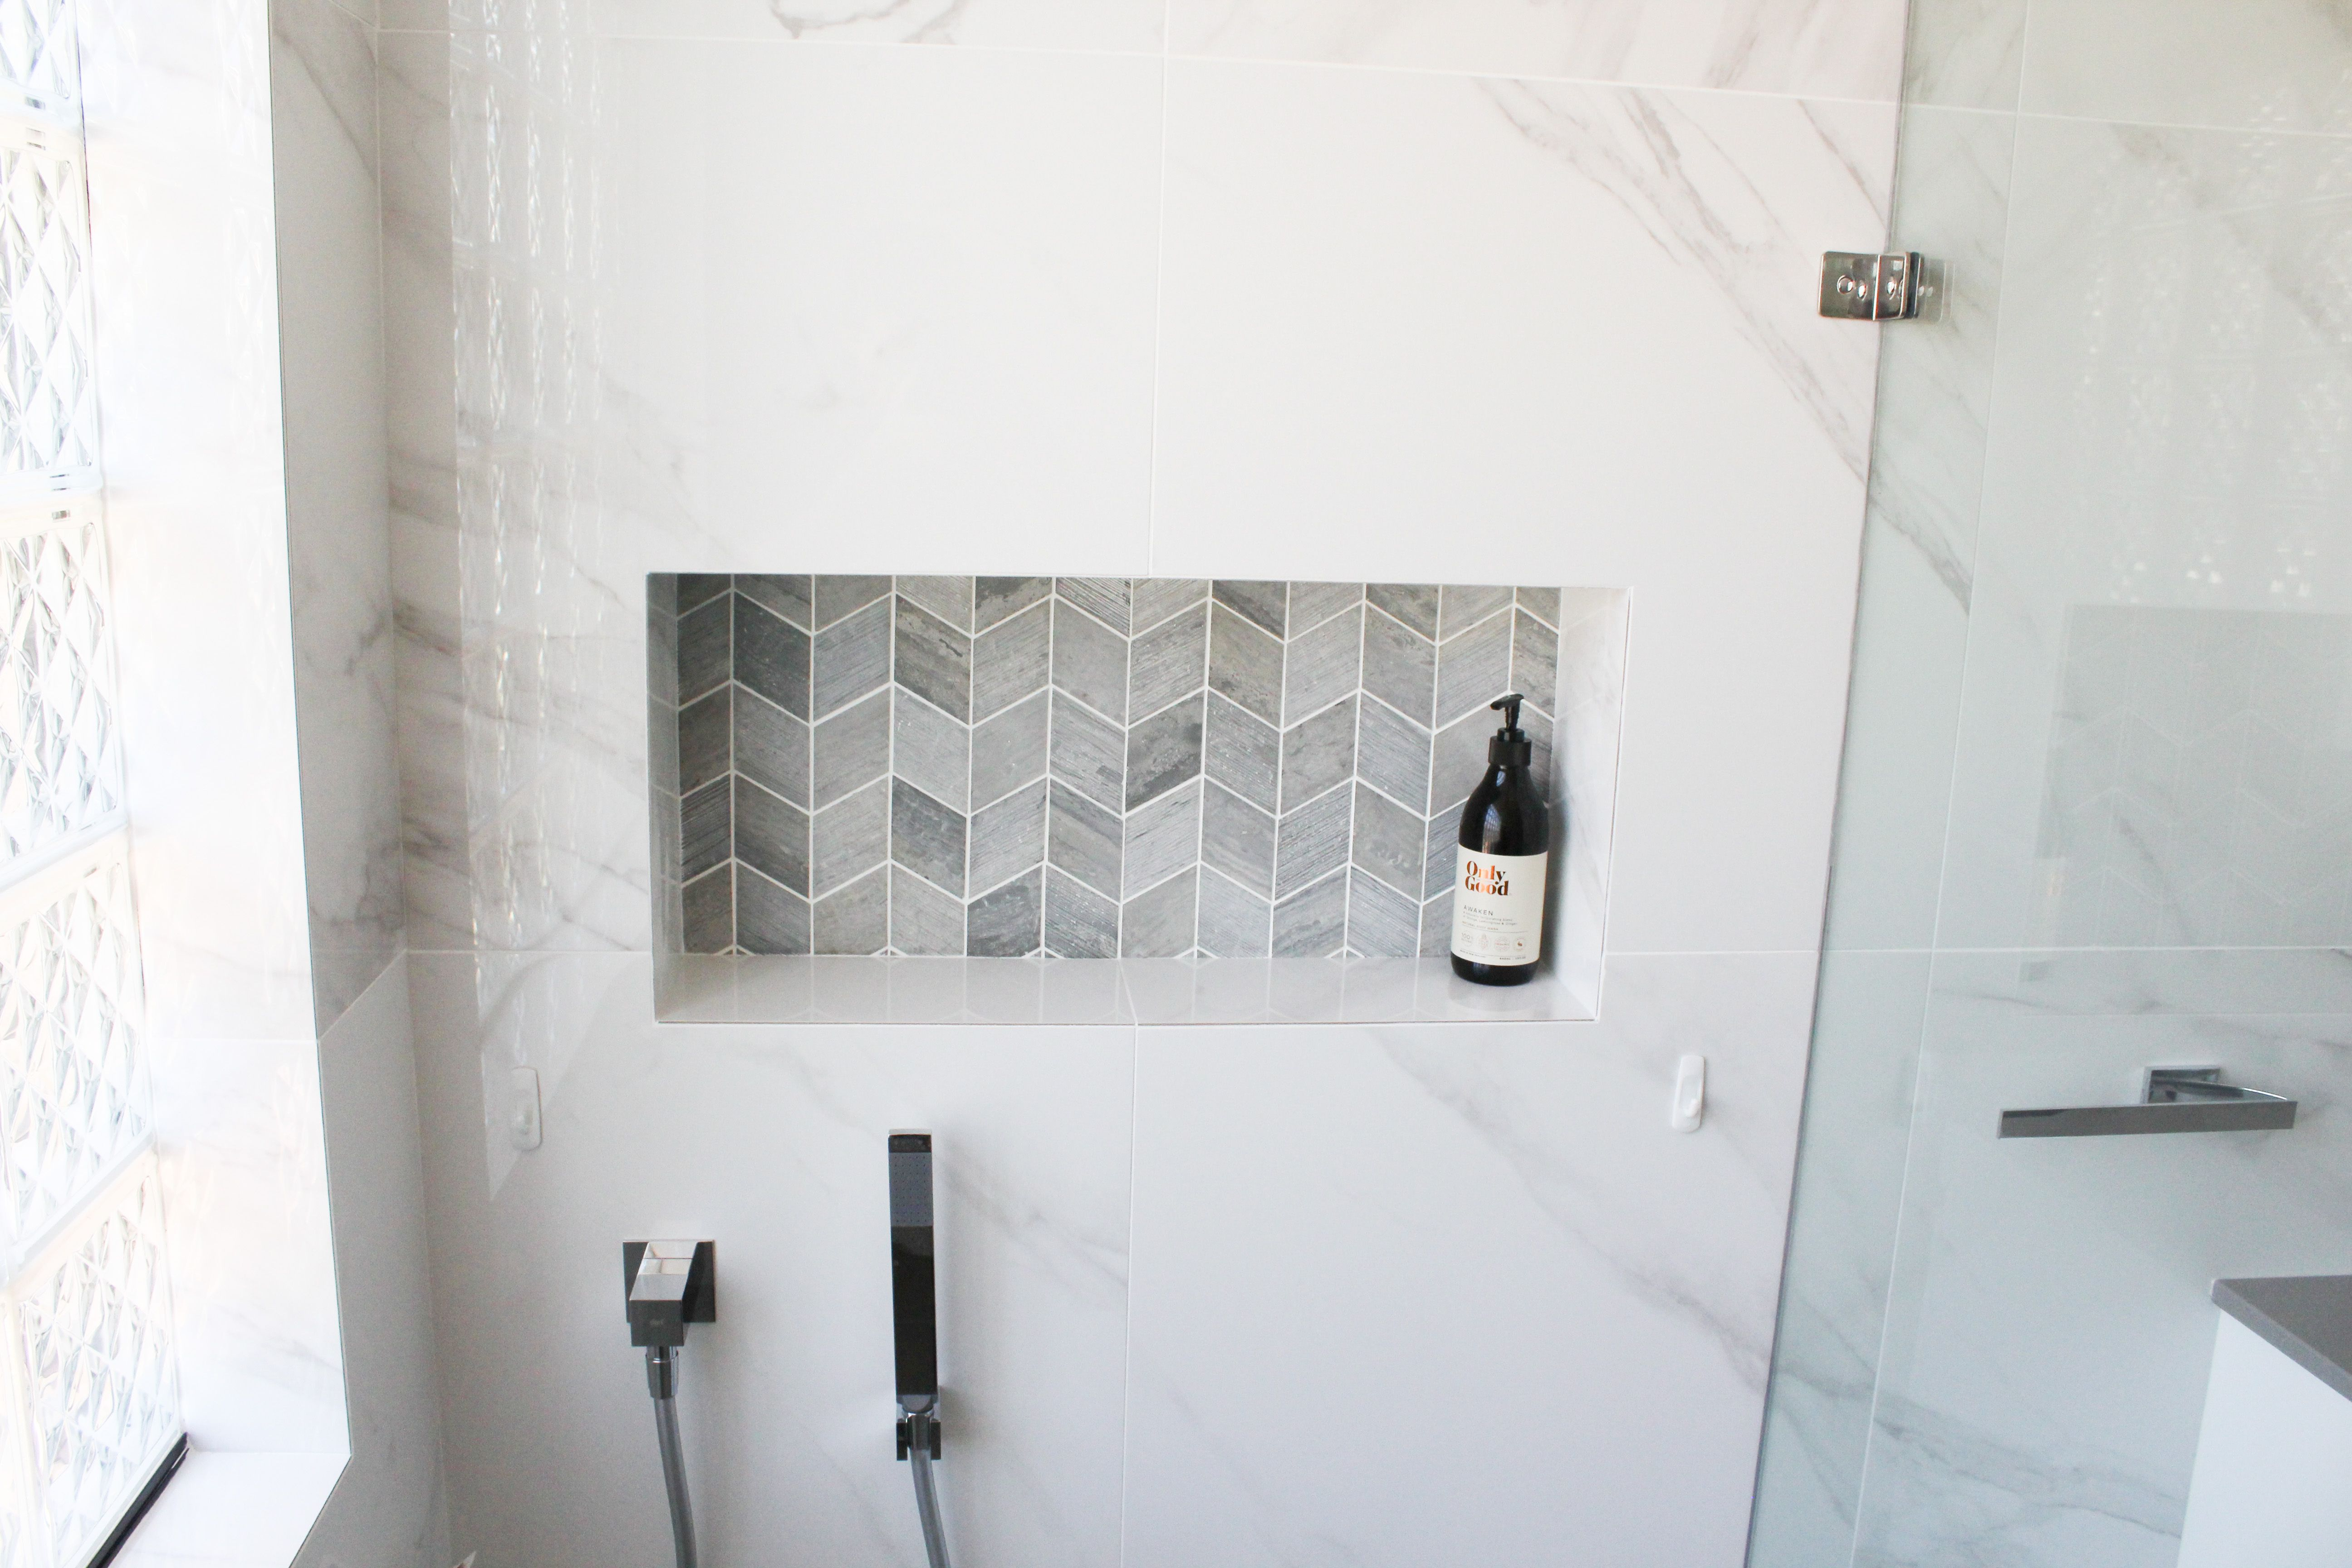 Shower Recess Niche Shelf In Wall